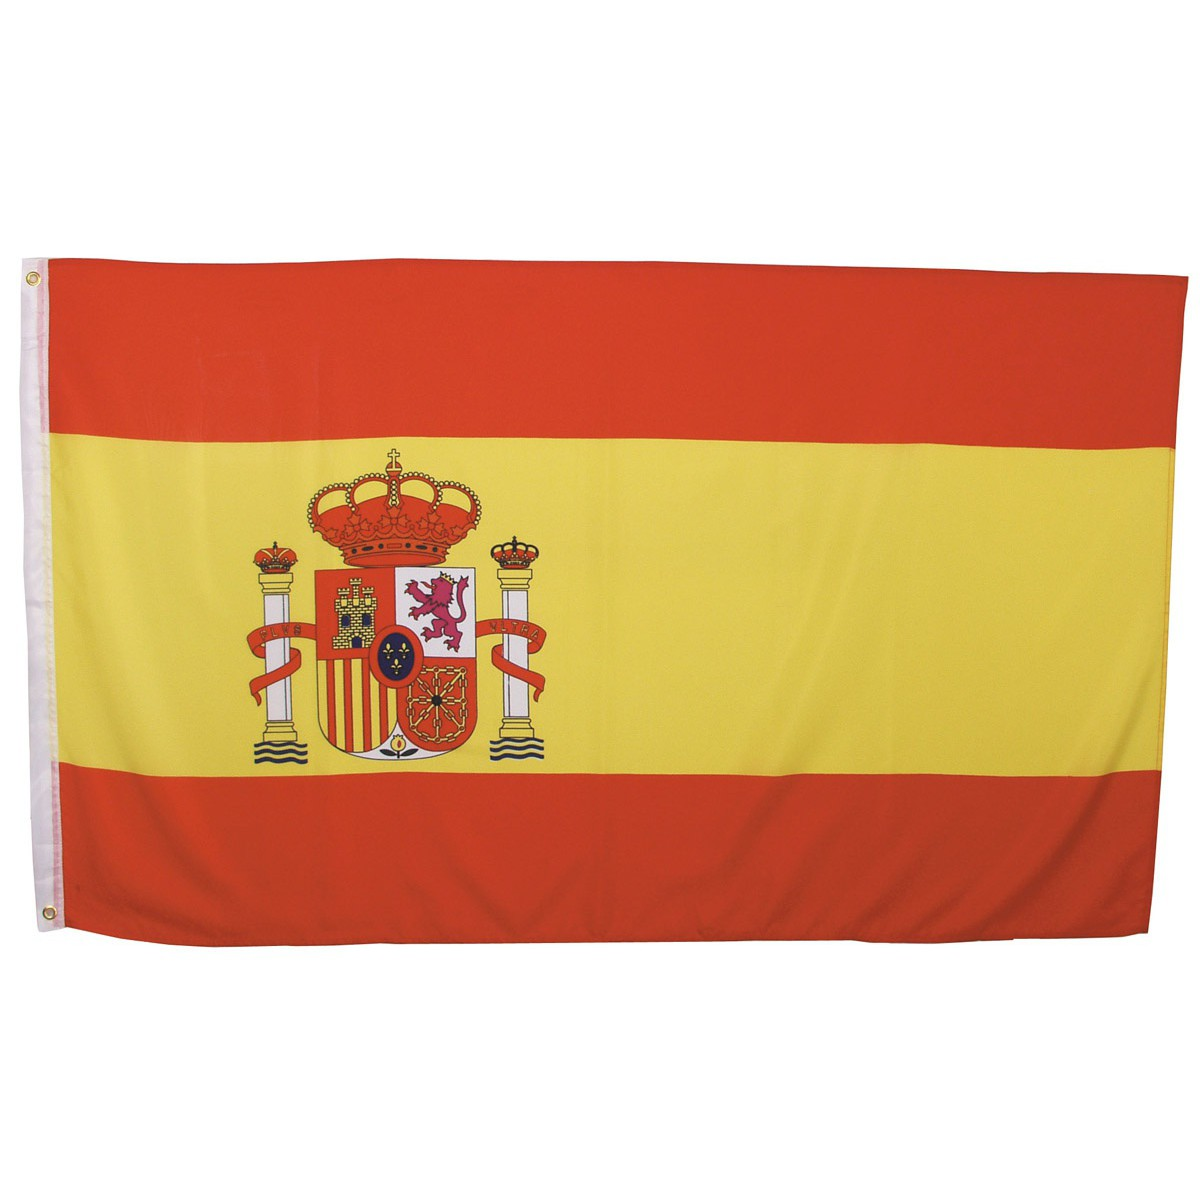 Španielska vlajka 150x90cm obojstranná polyester megamix.sk